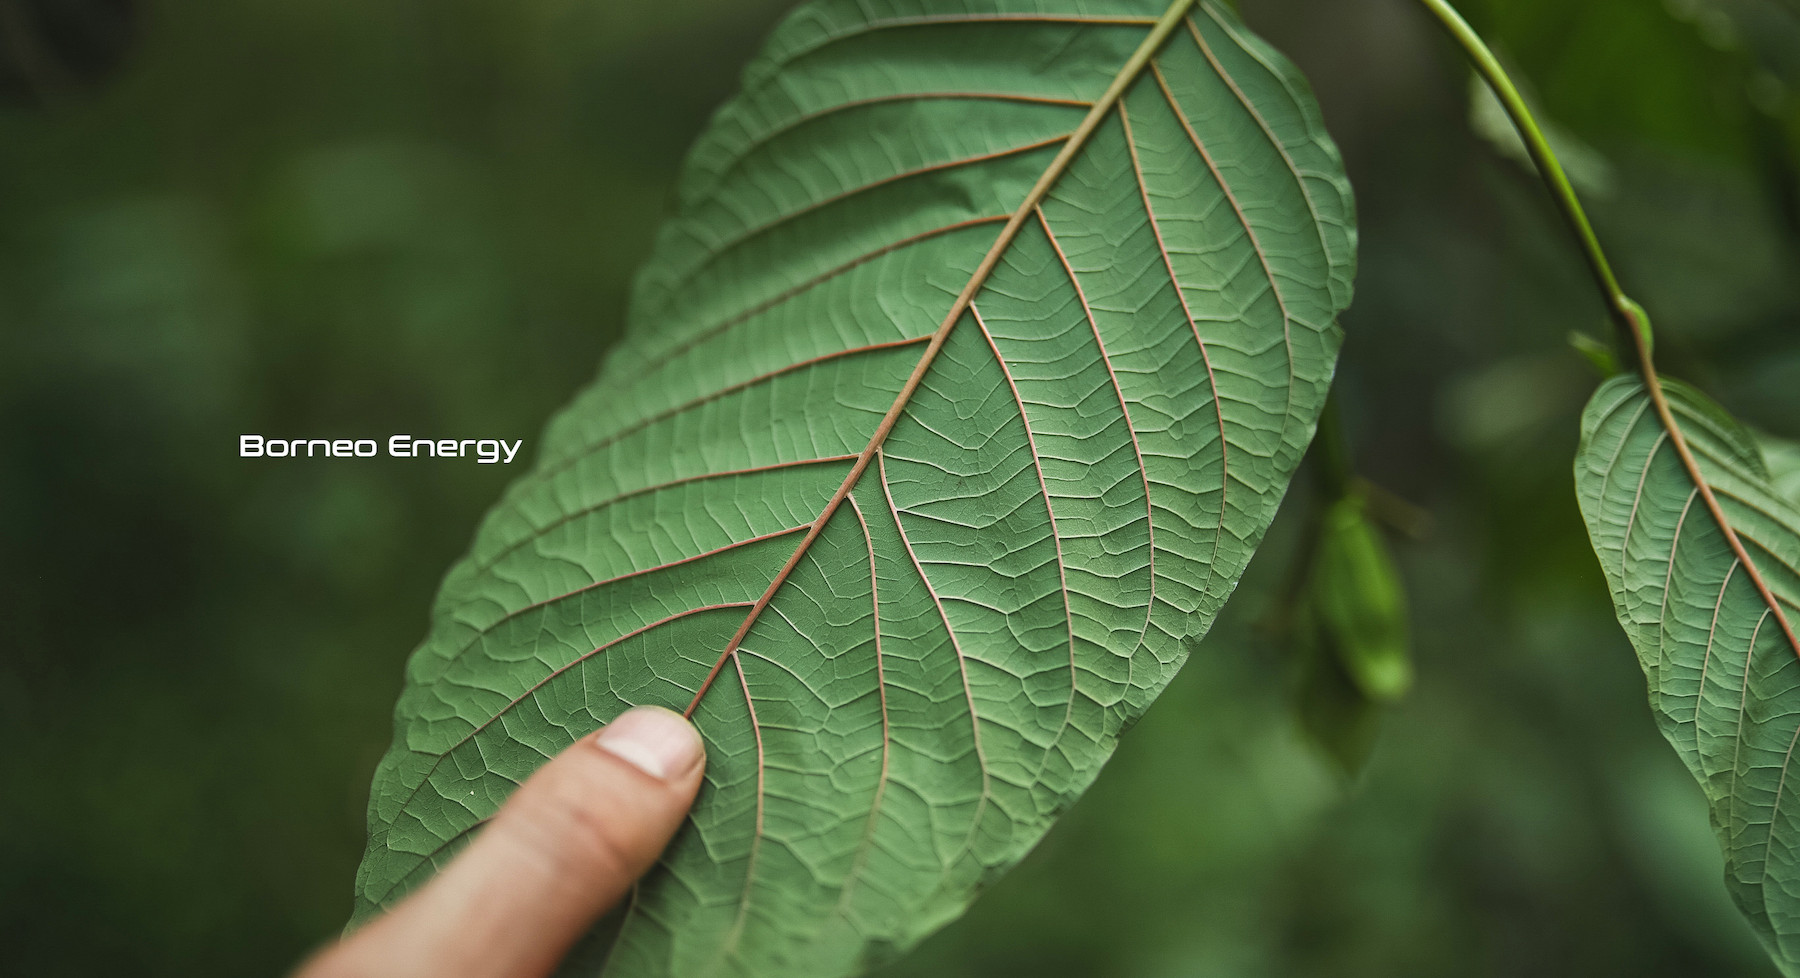 borneo_energy_kratom.jpg